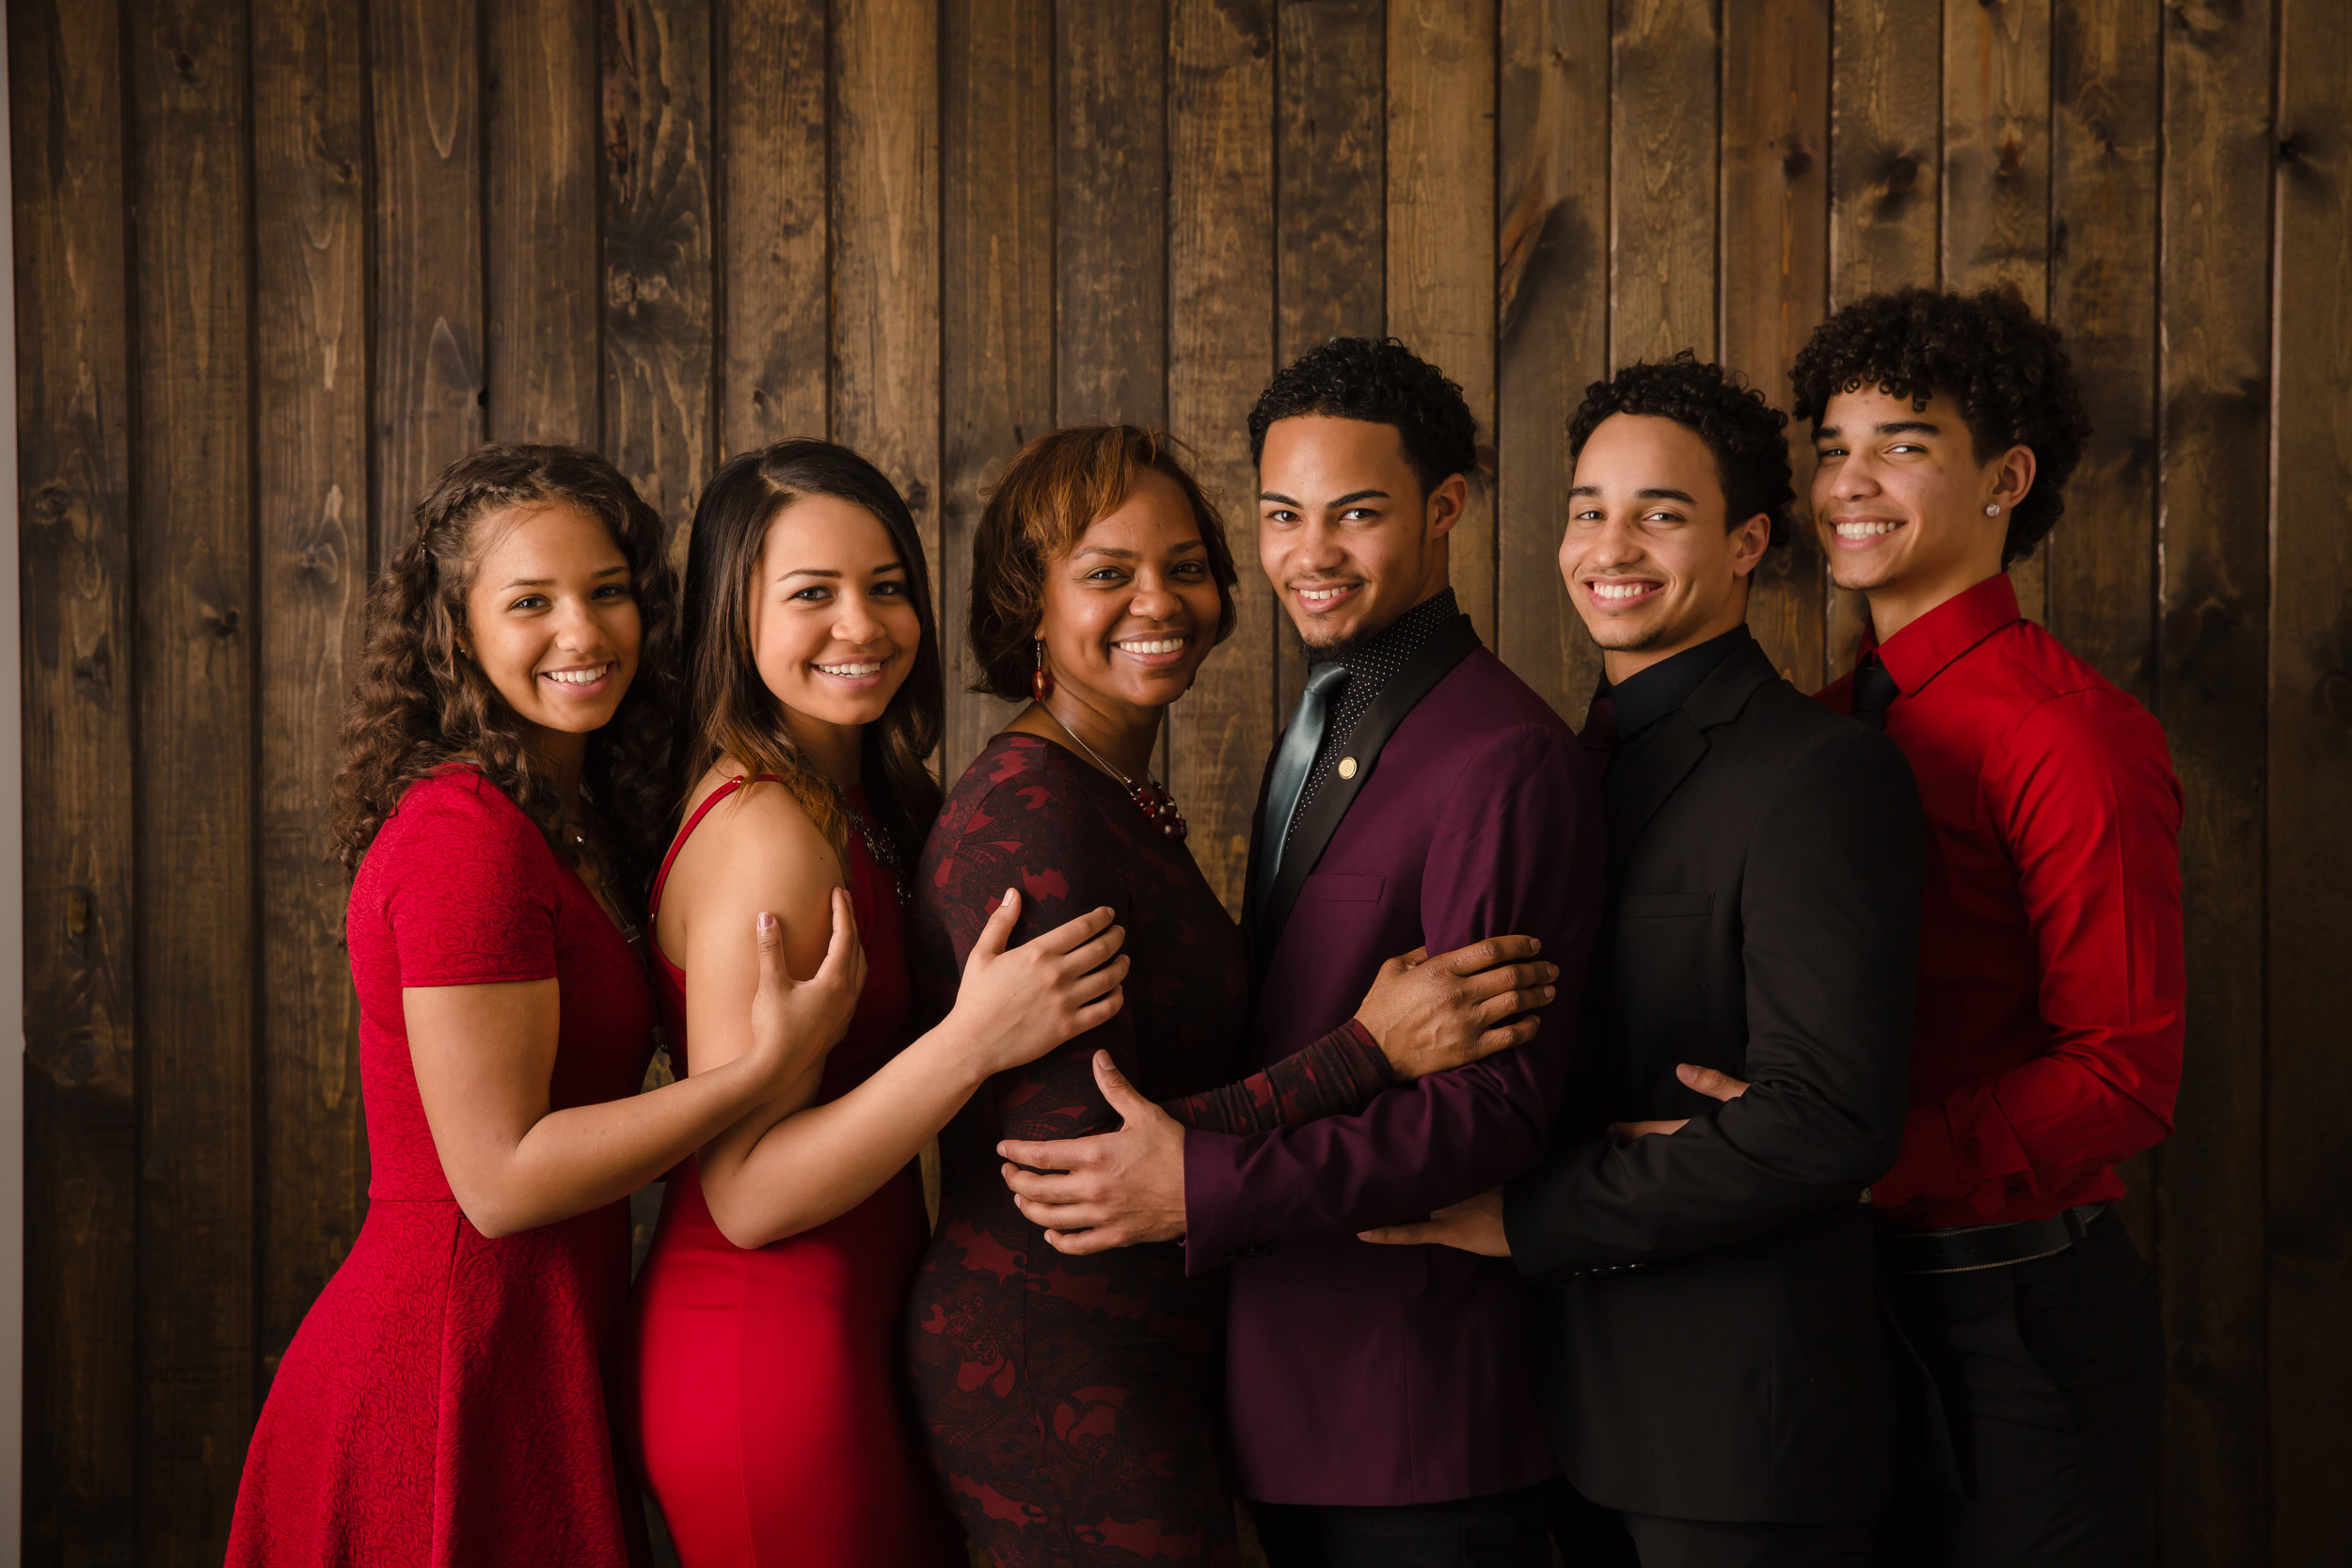 soniafamily-1.jpg